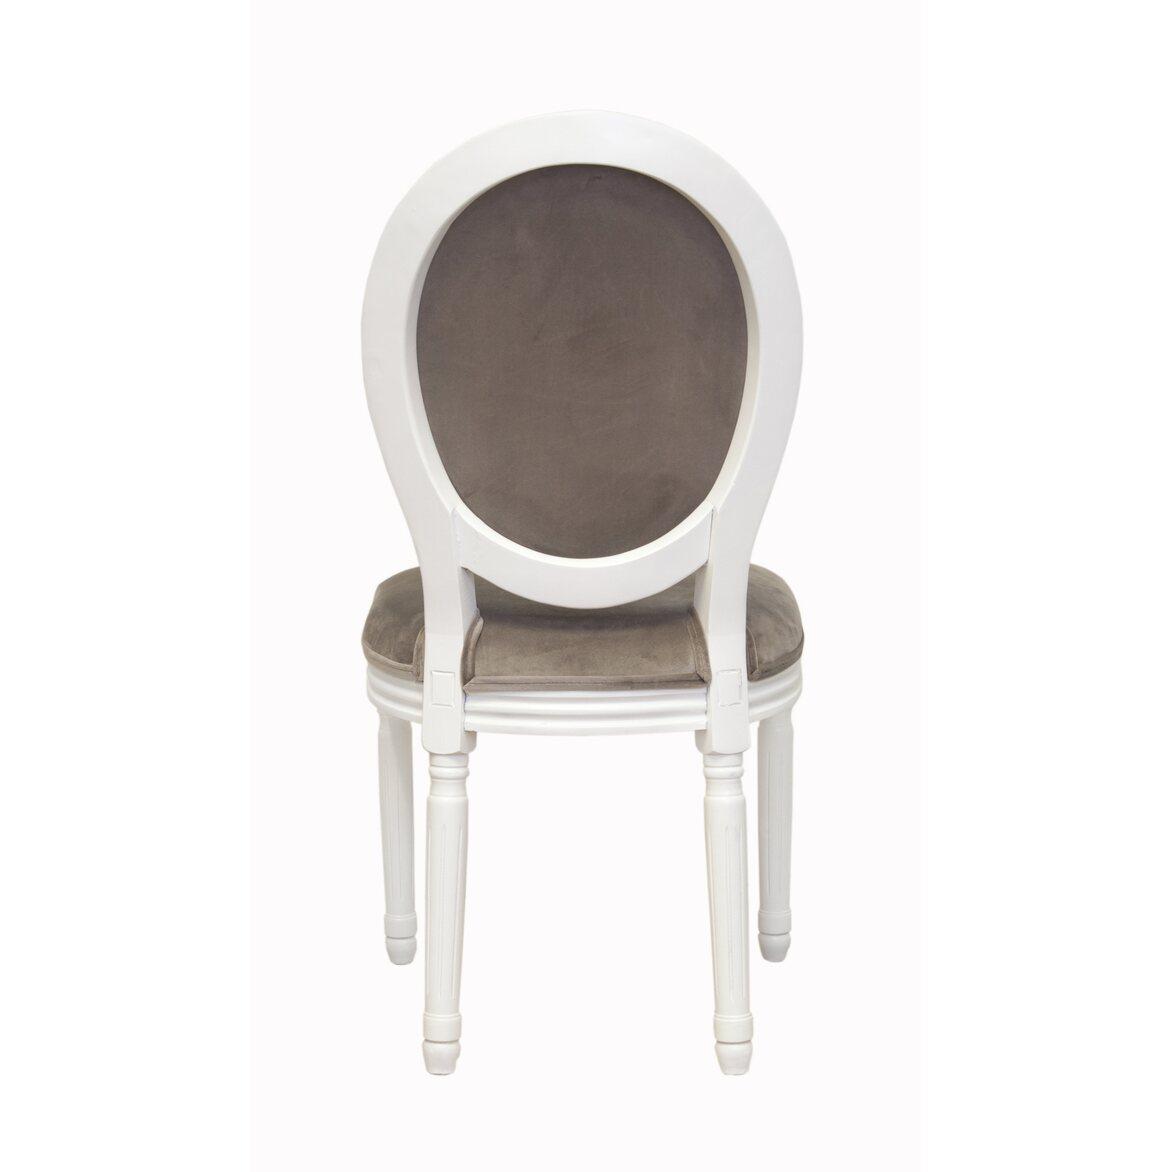 Стул Volker taupe 3 | Обеденные стулья Kingsby